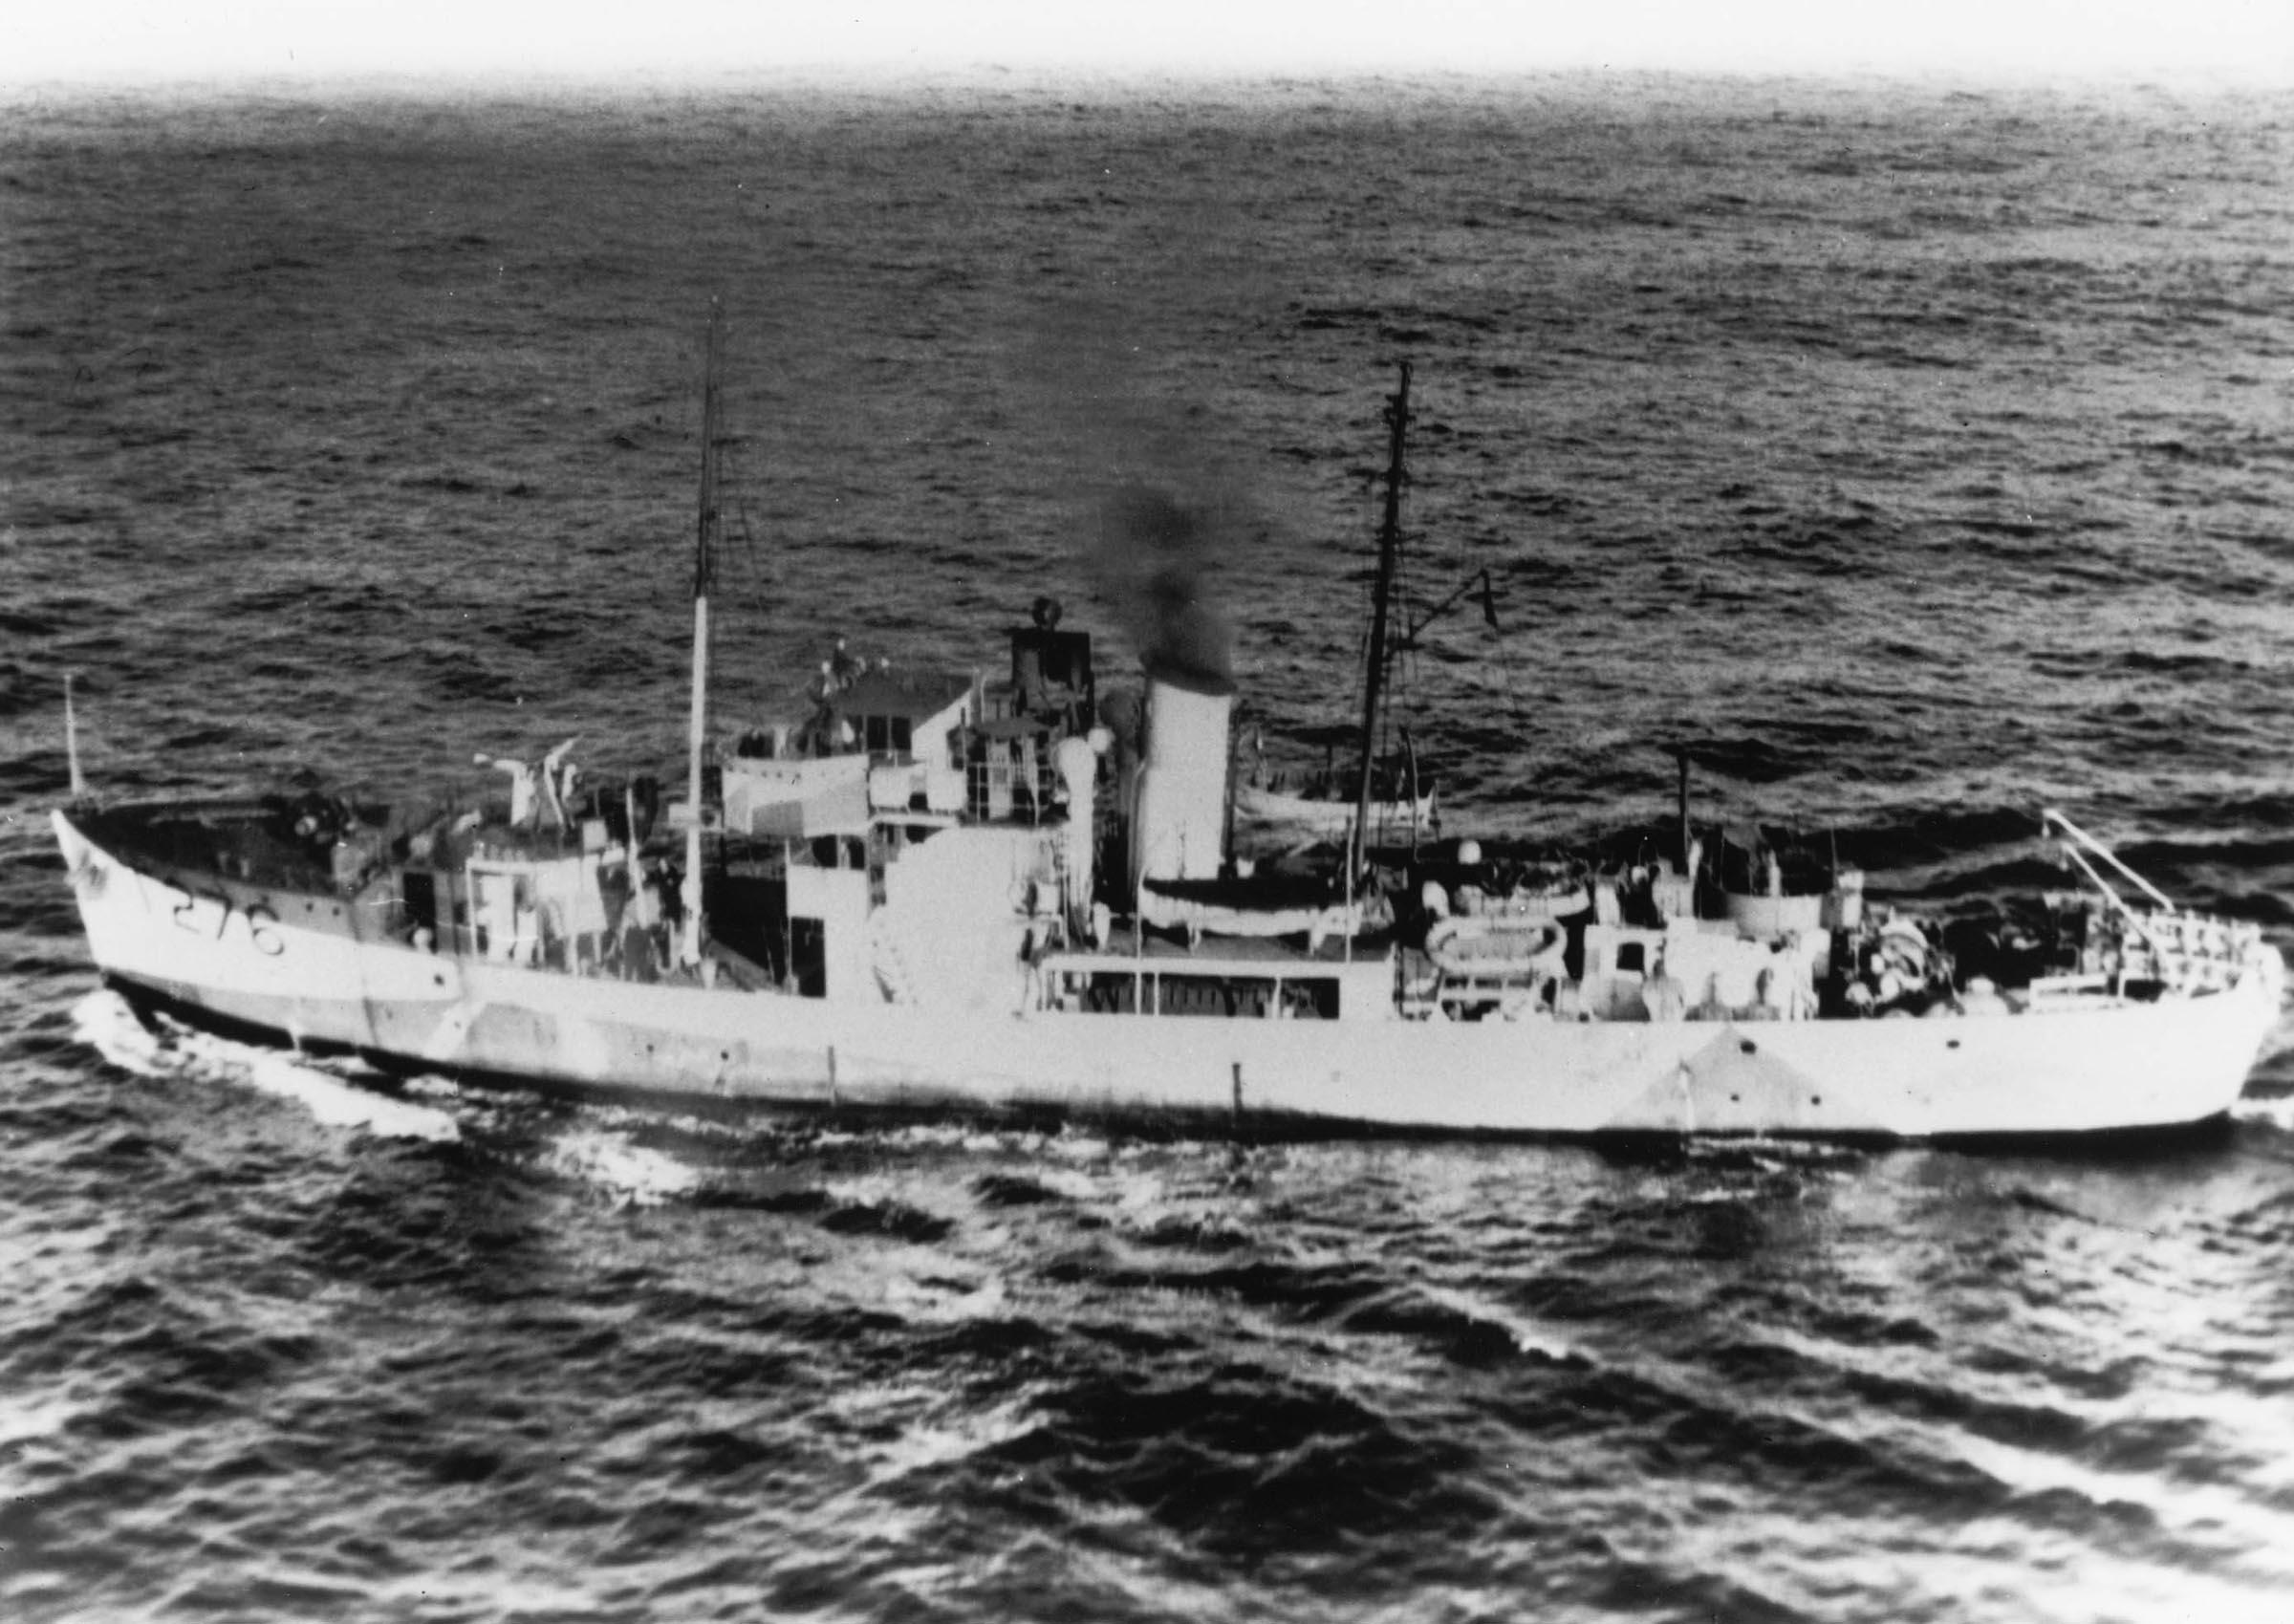 HMCS CAILIFF